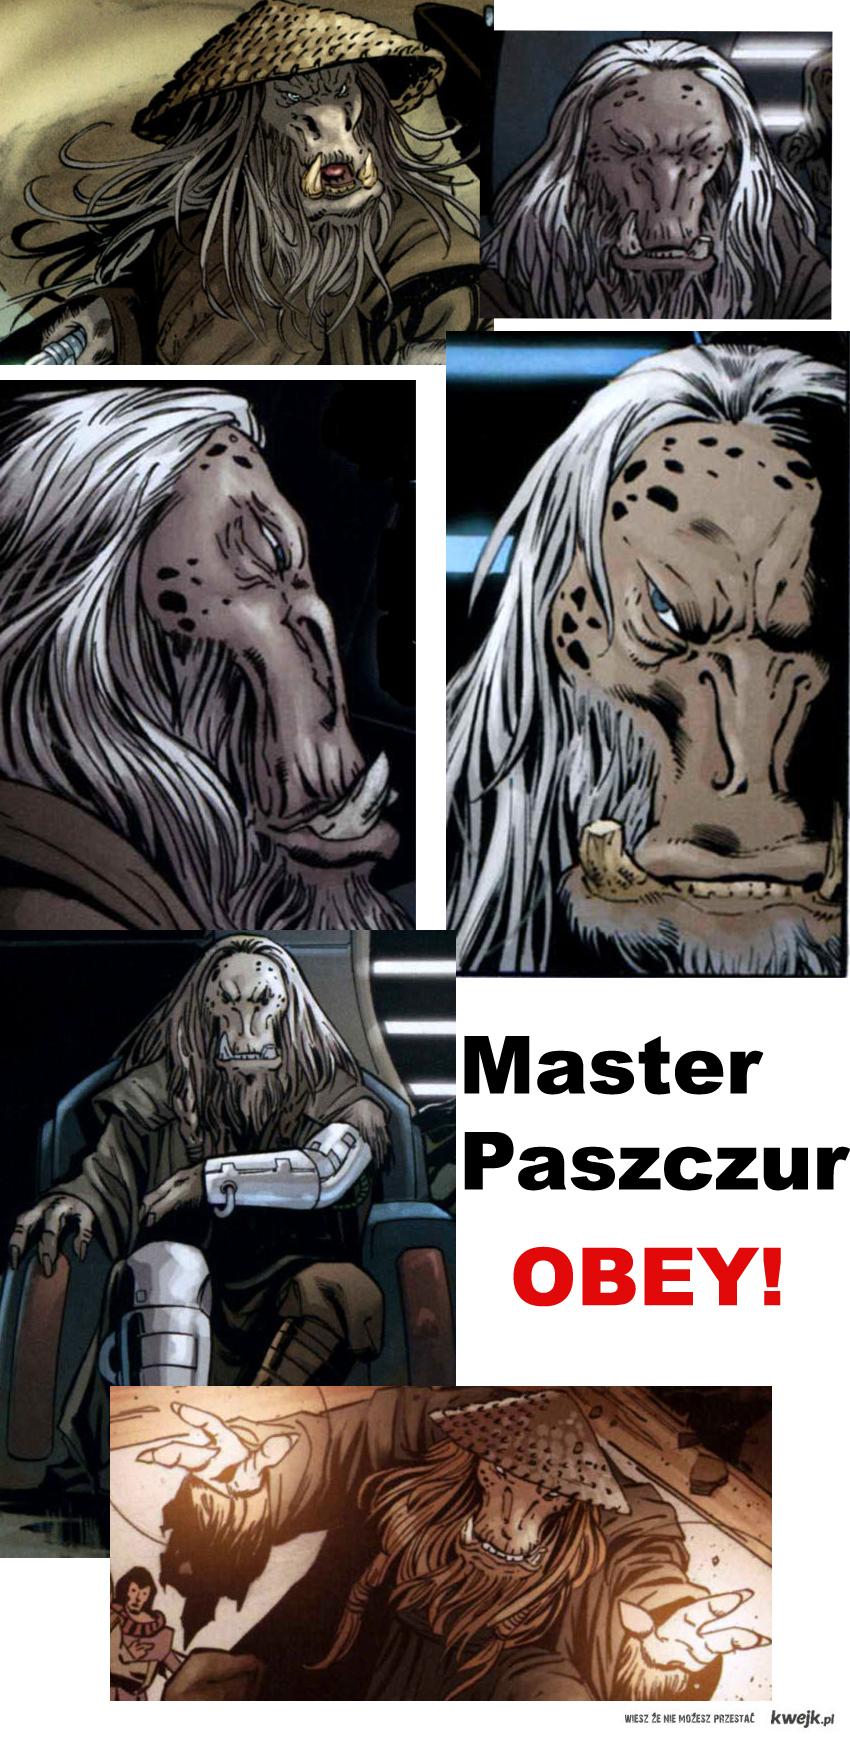 Master Paszczur